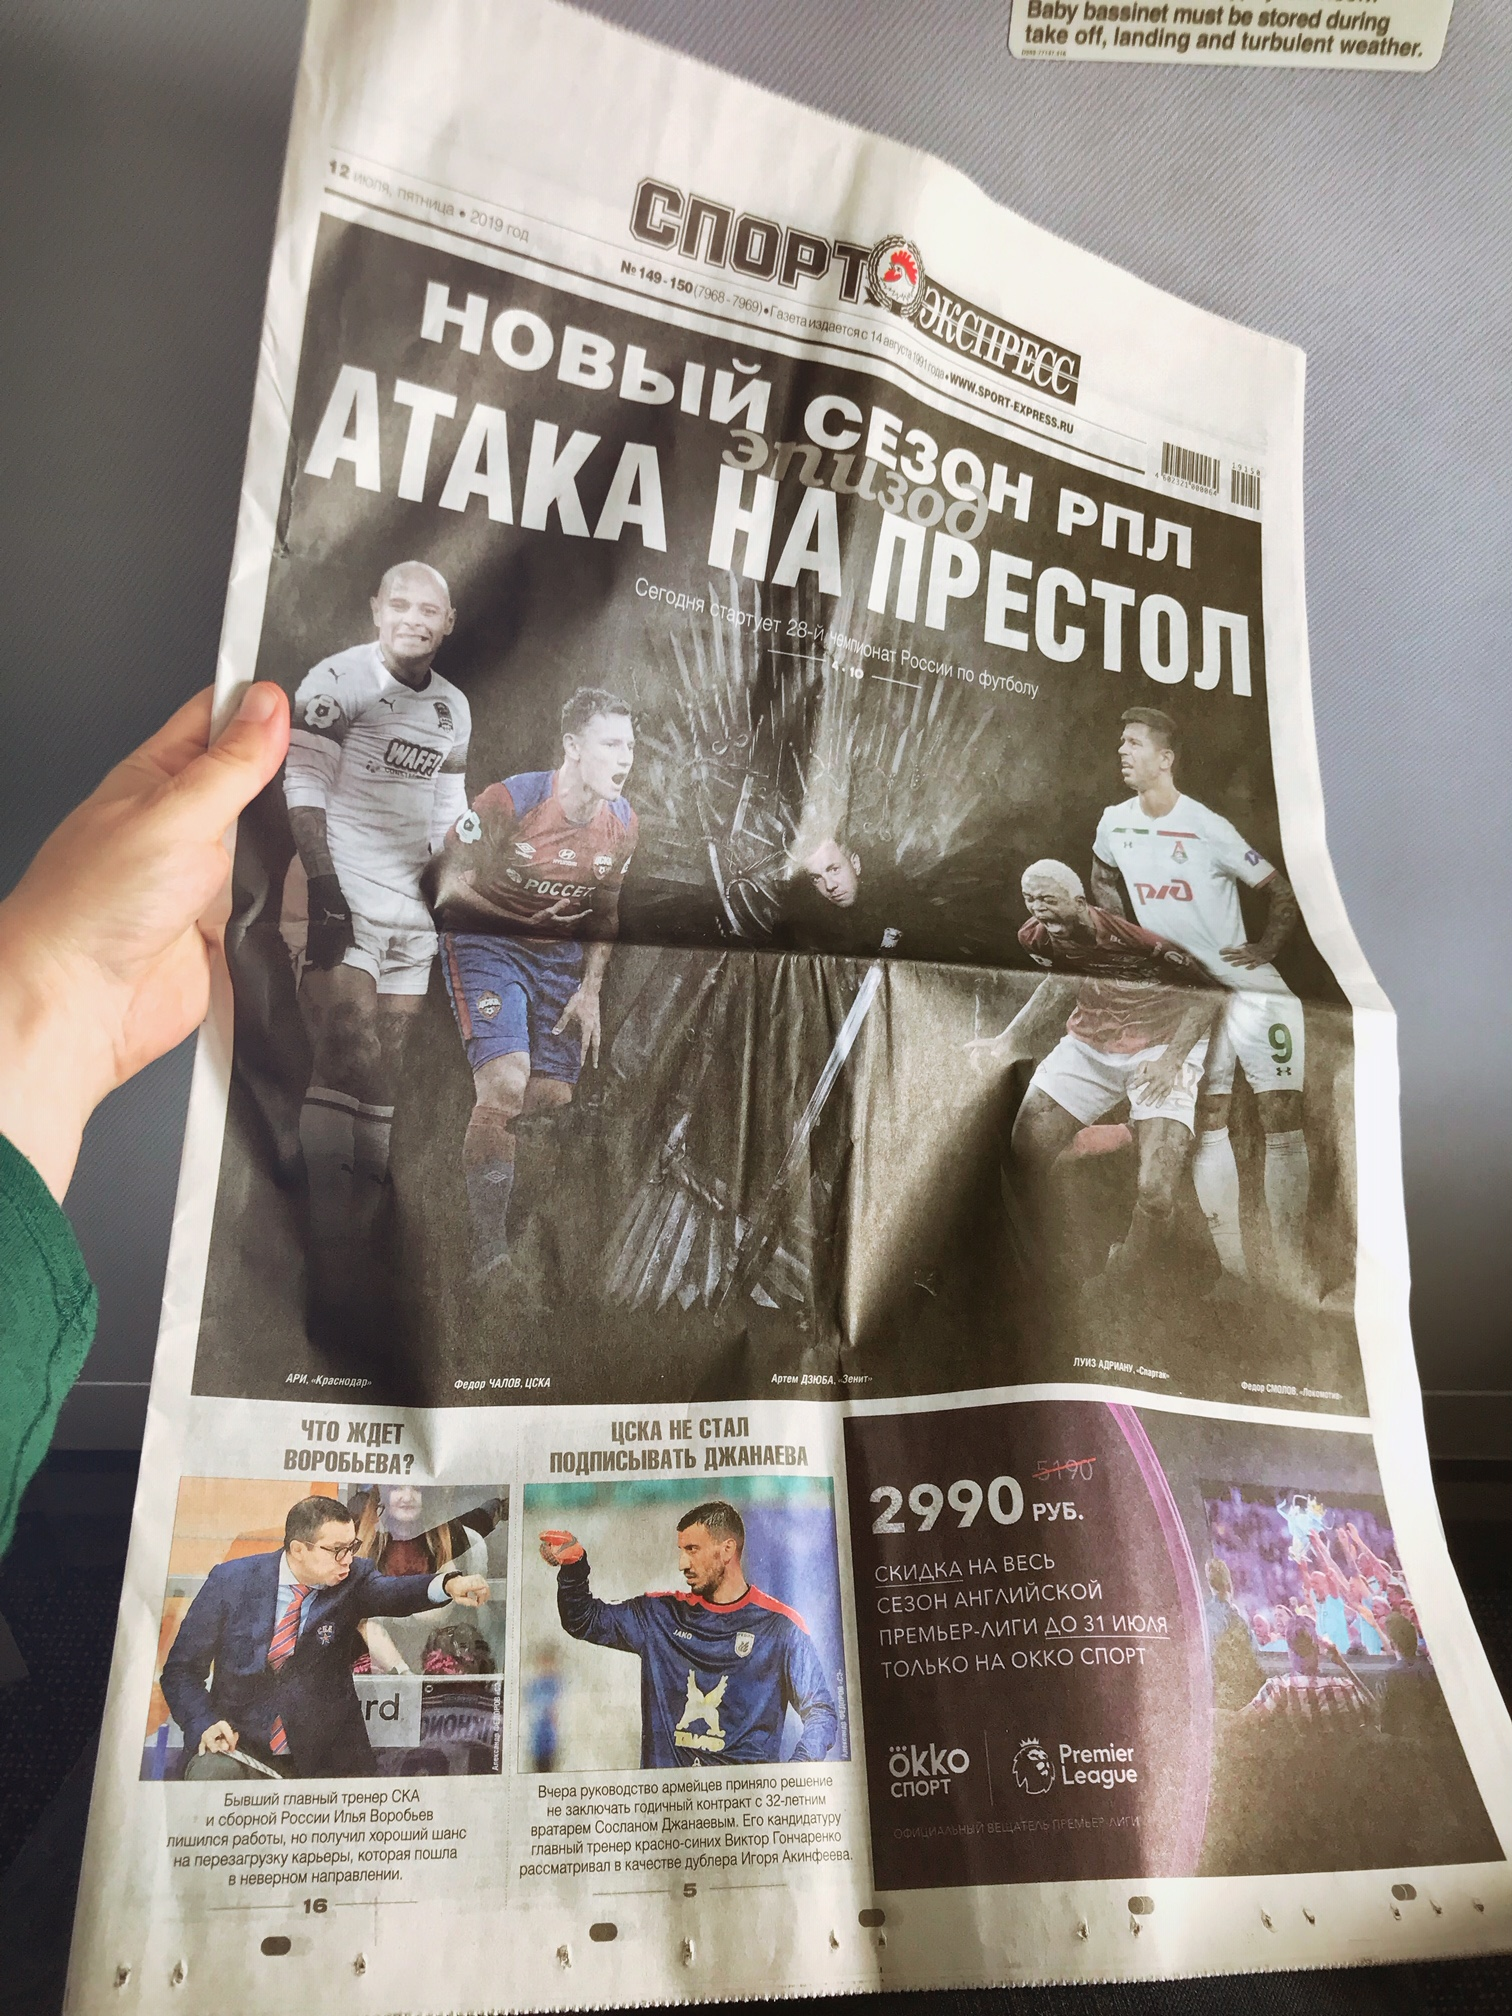 kscheib russball sport express premjer liga 2019